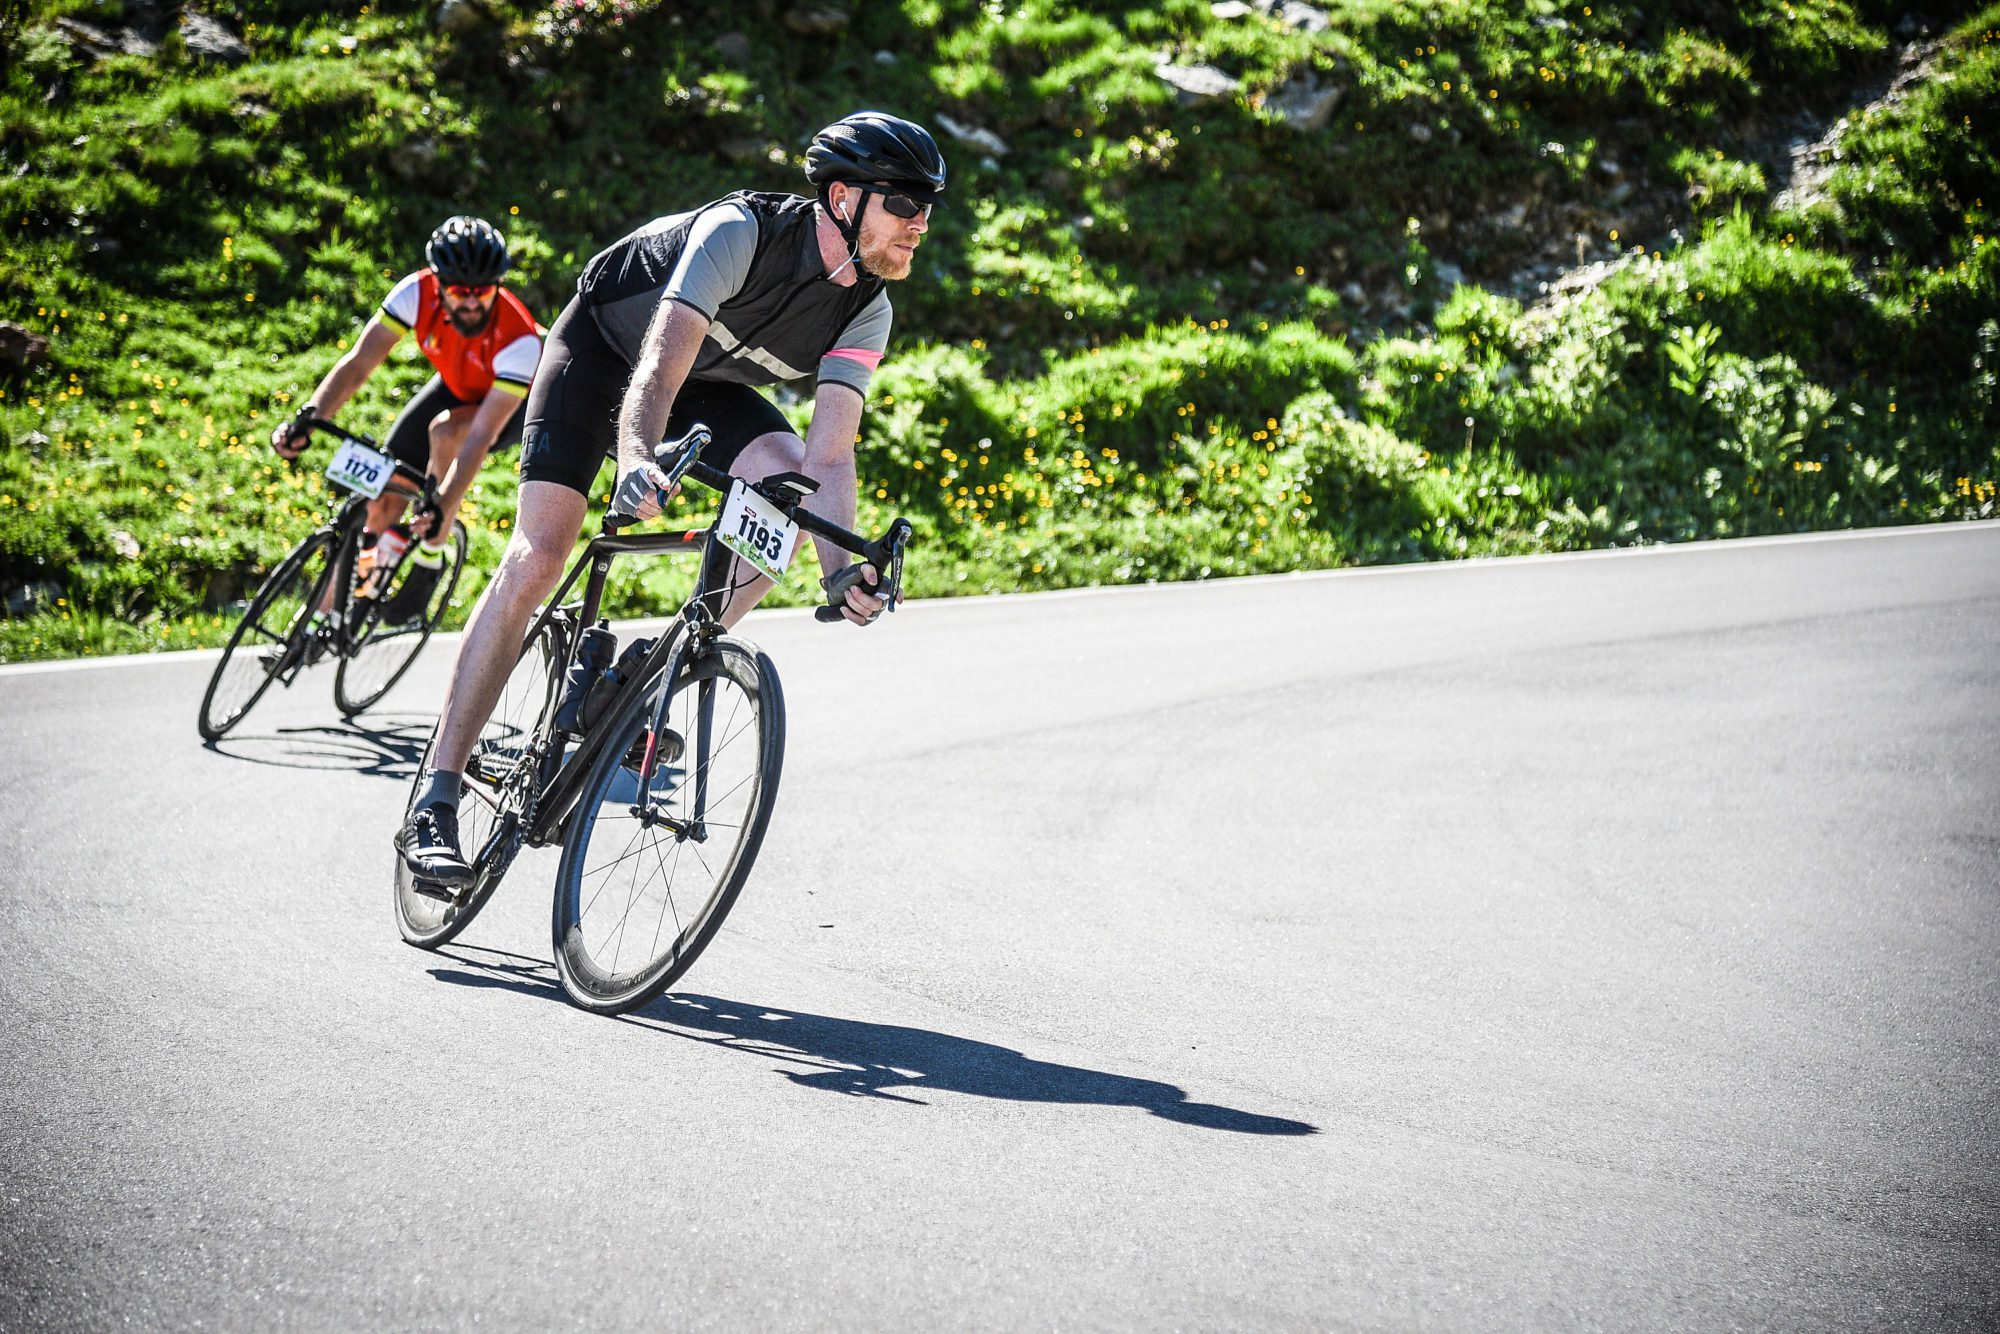 CyclingClubDuesseldorf-Dreilaendergiro Abfahrt vom Stelvio